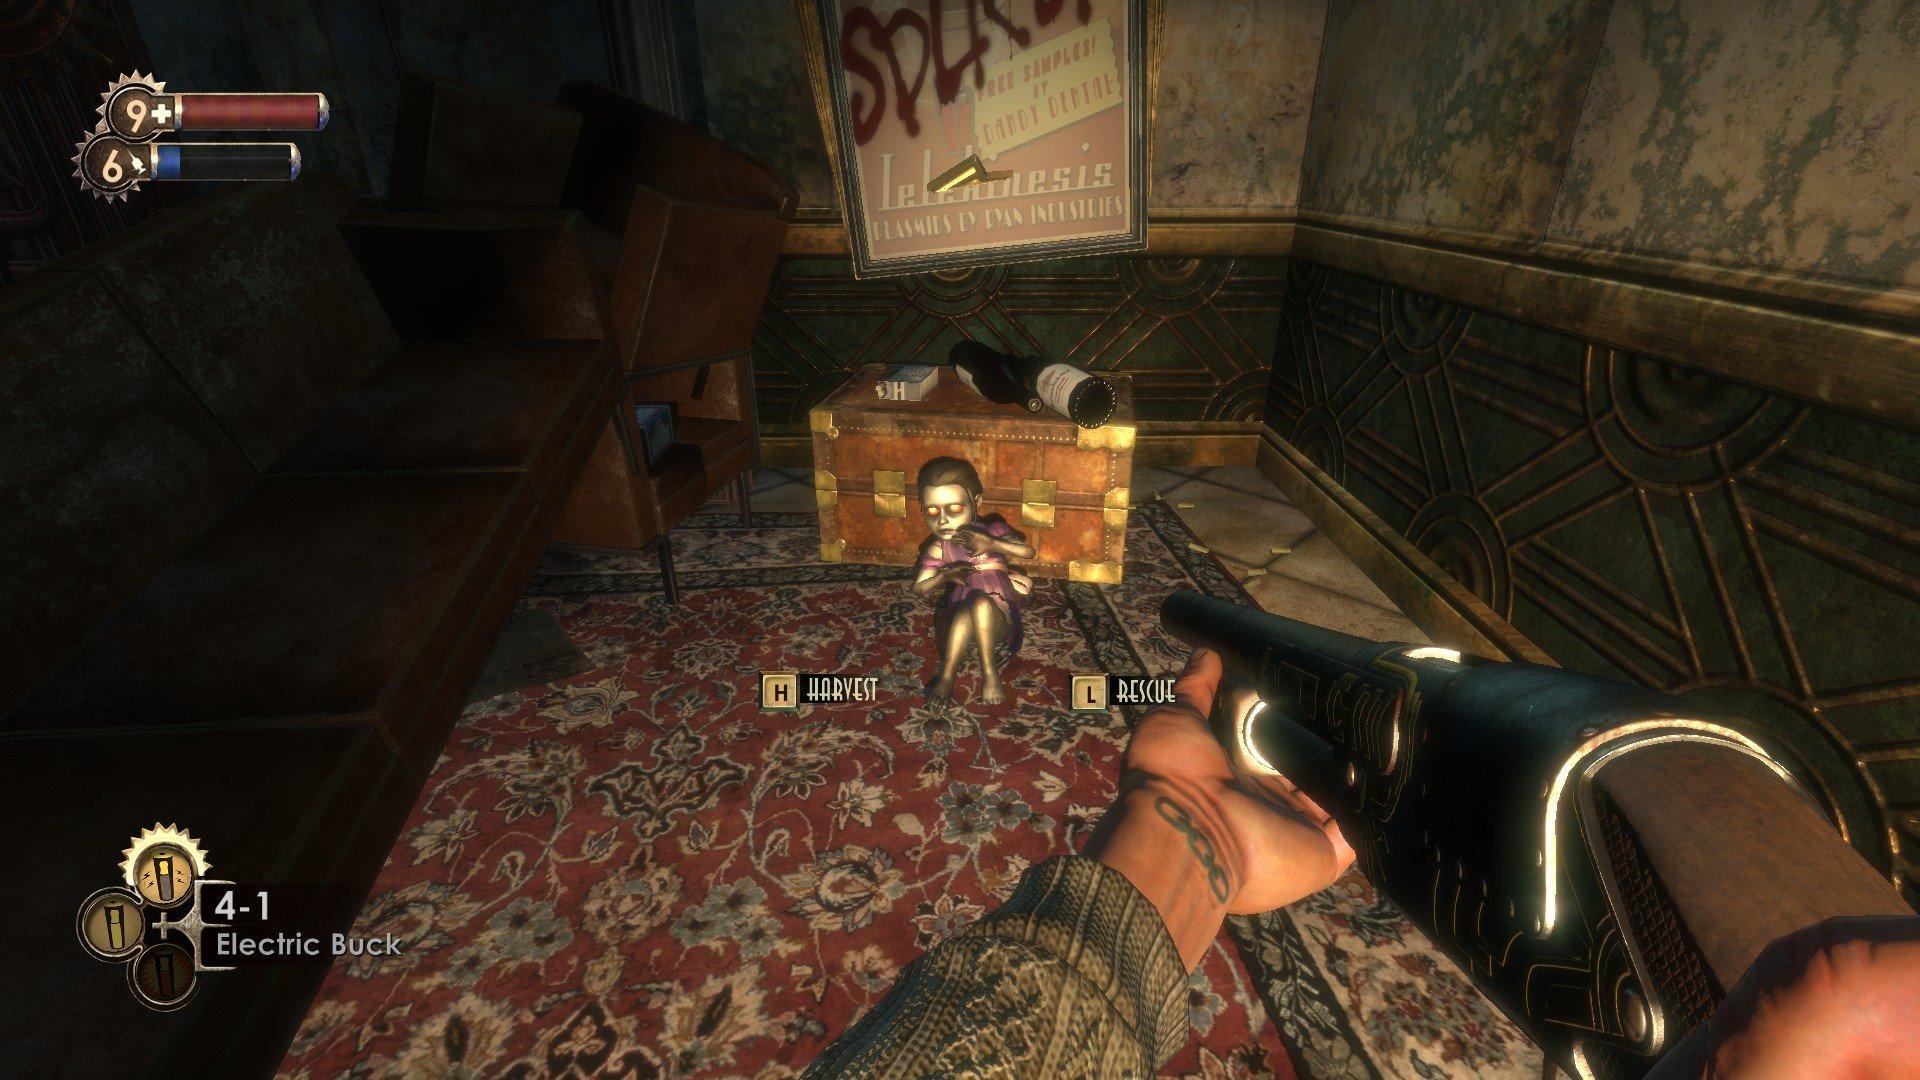 BioShock speciale